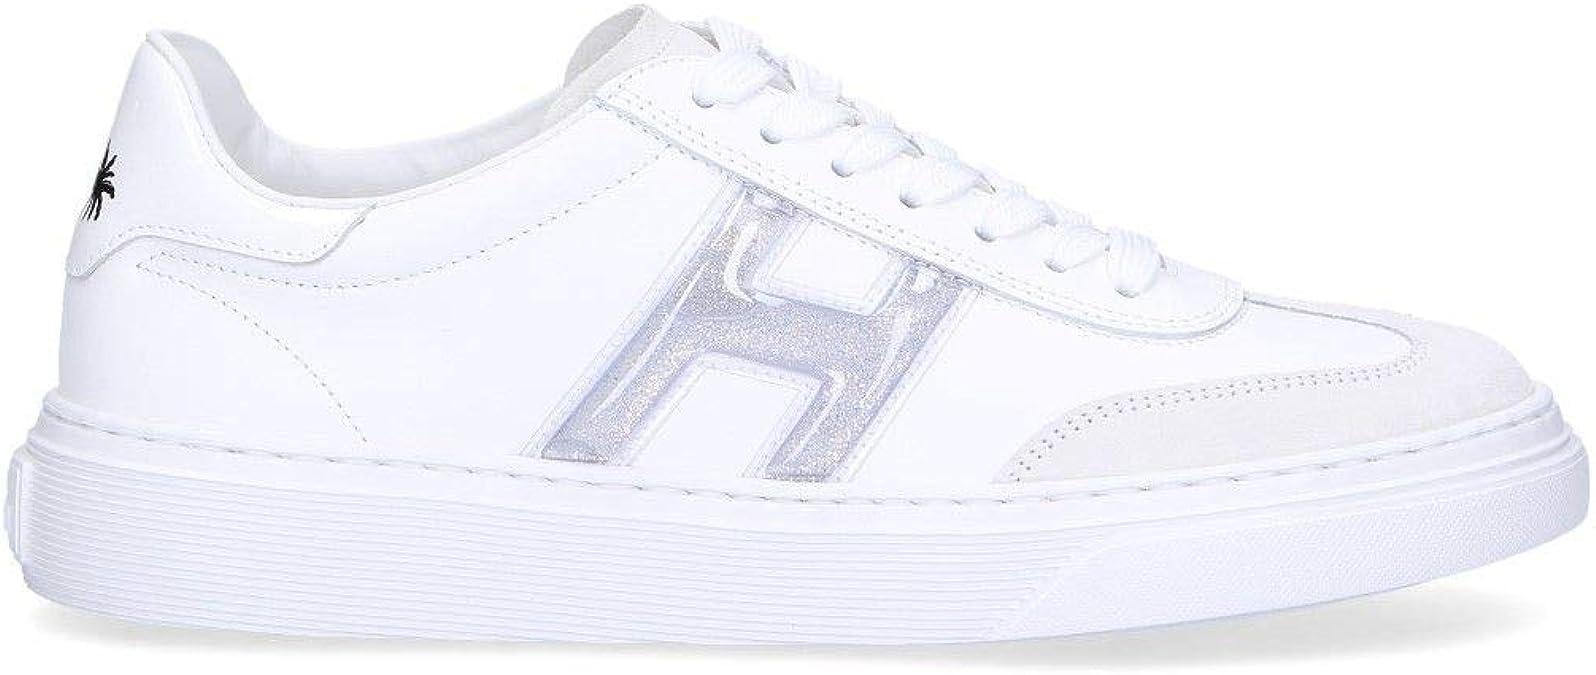 Hogan HXW3650BJ50KGYB001 Sneaker in Pelle Bianca, Bianco ...